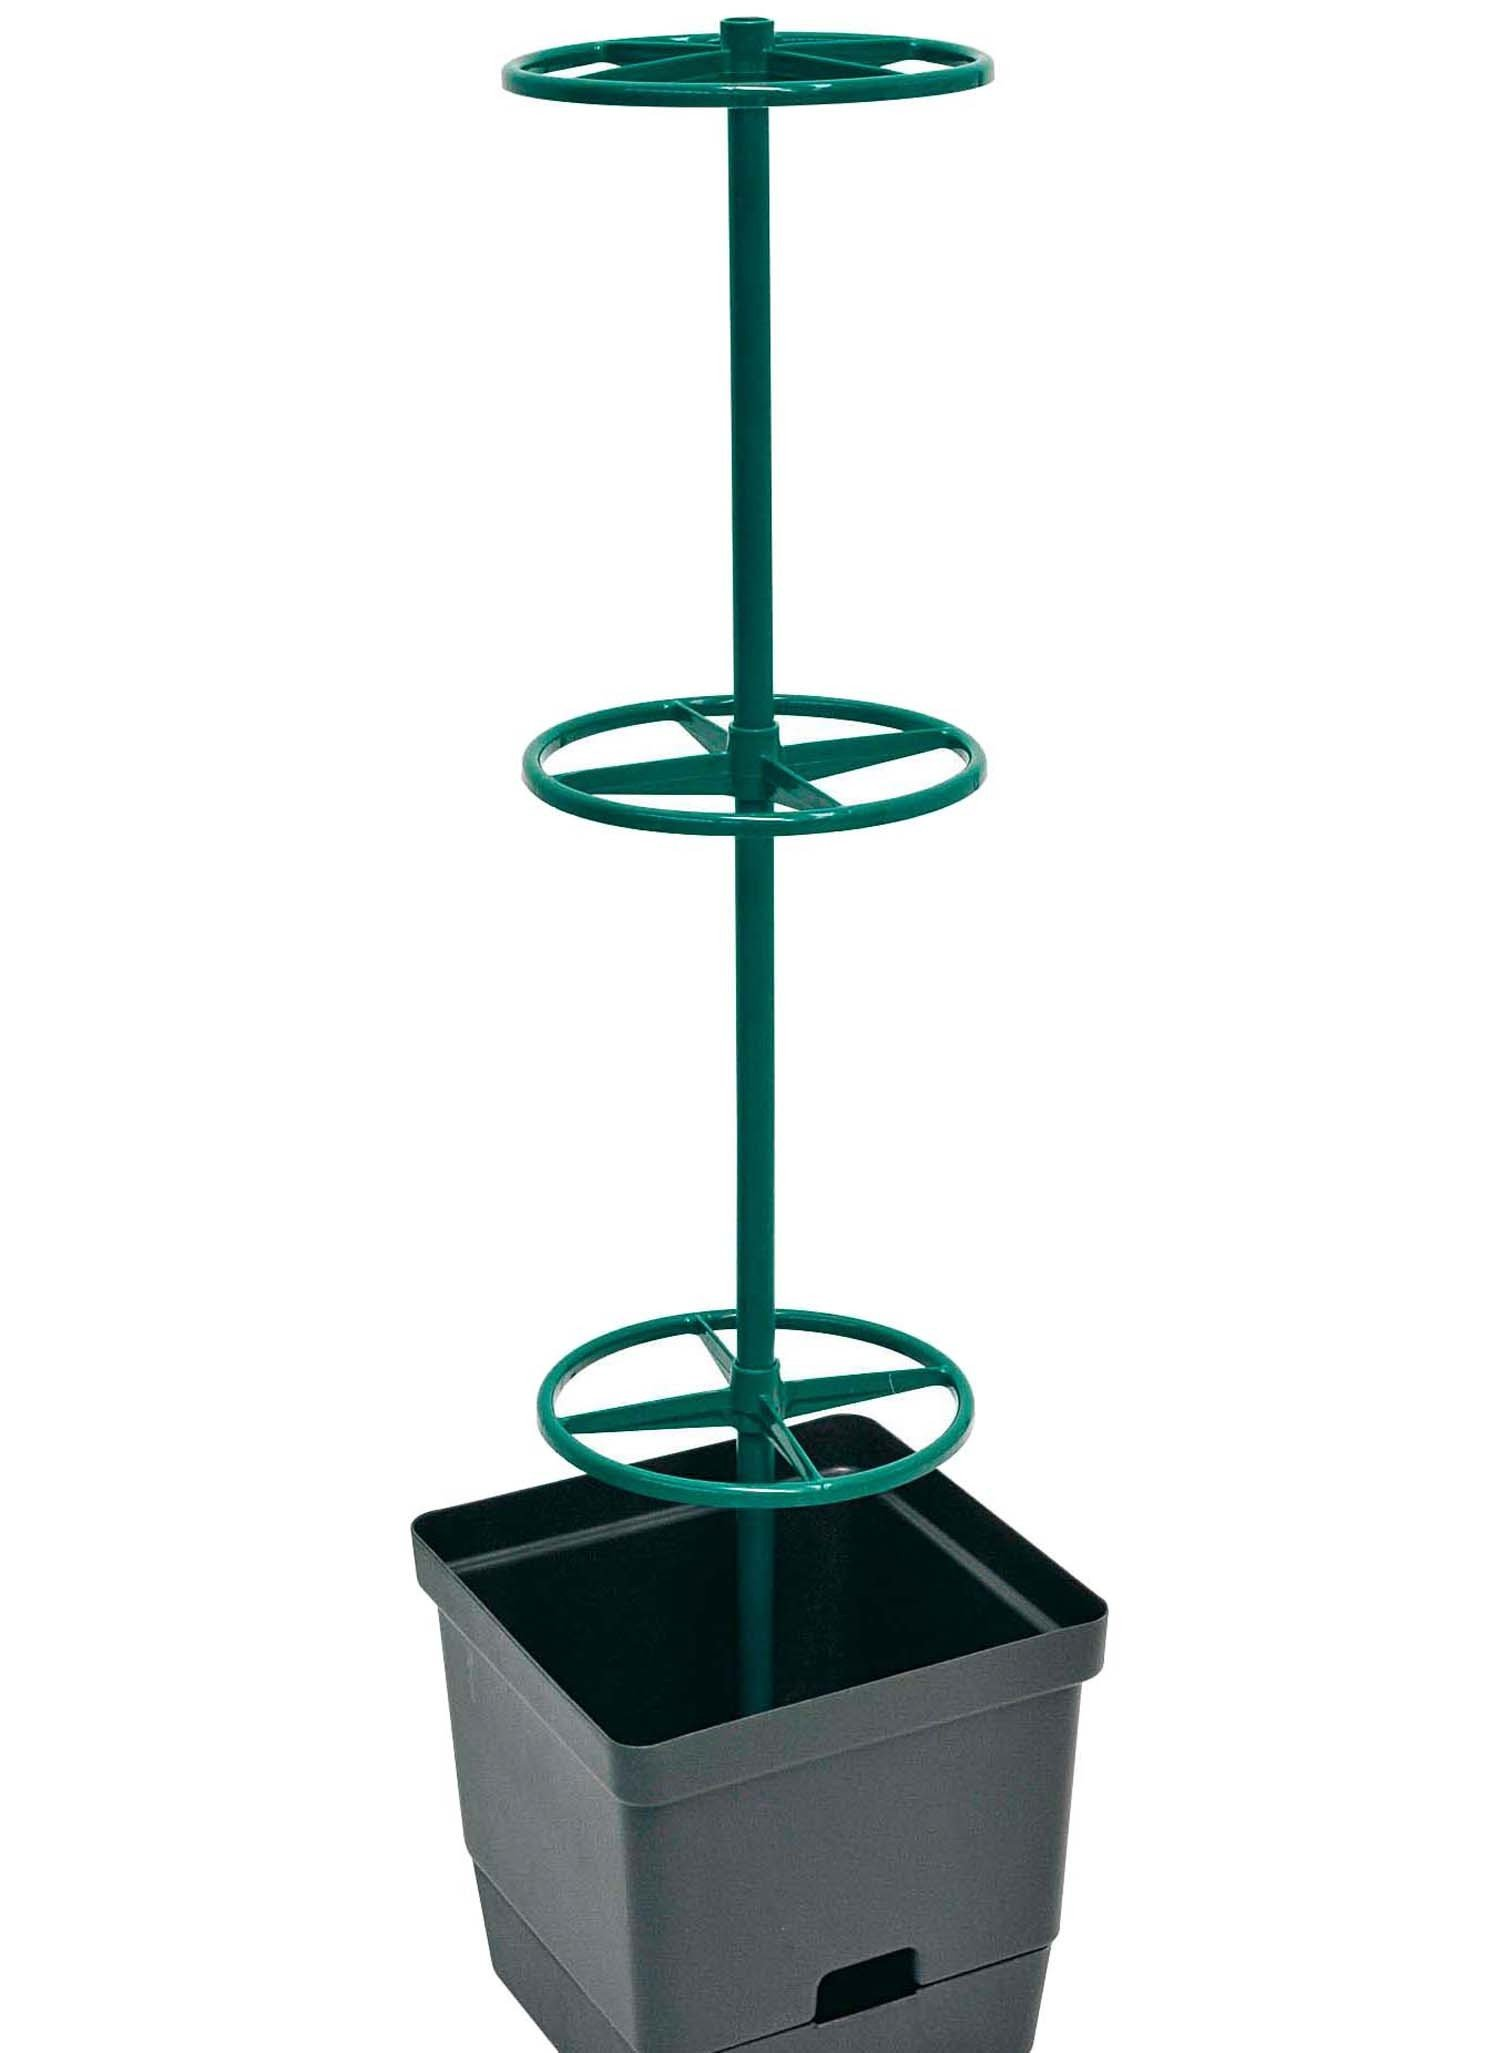 kletterpflanzen topf. Black Bedroom Furniture Sets. Home Design Ideas